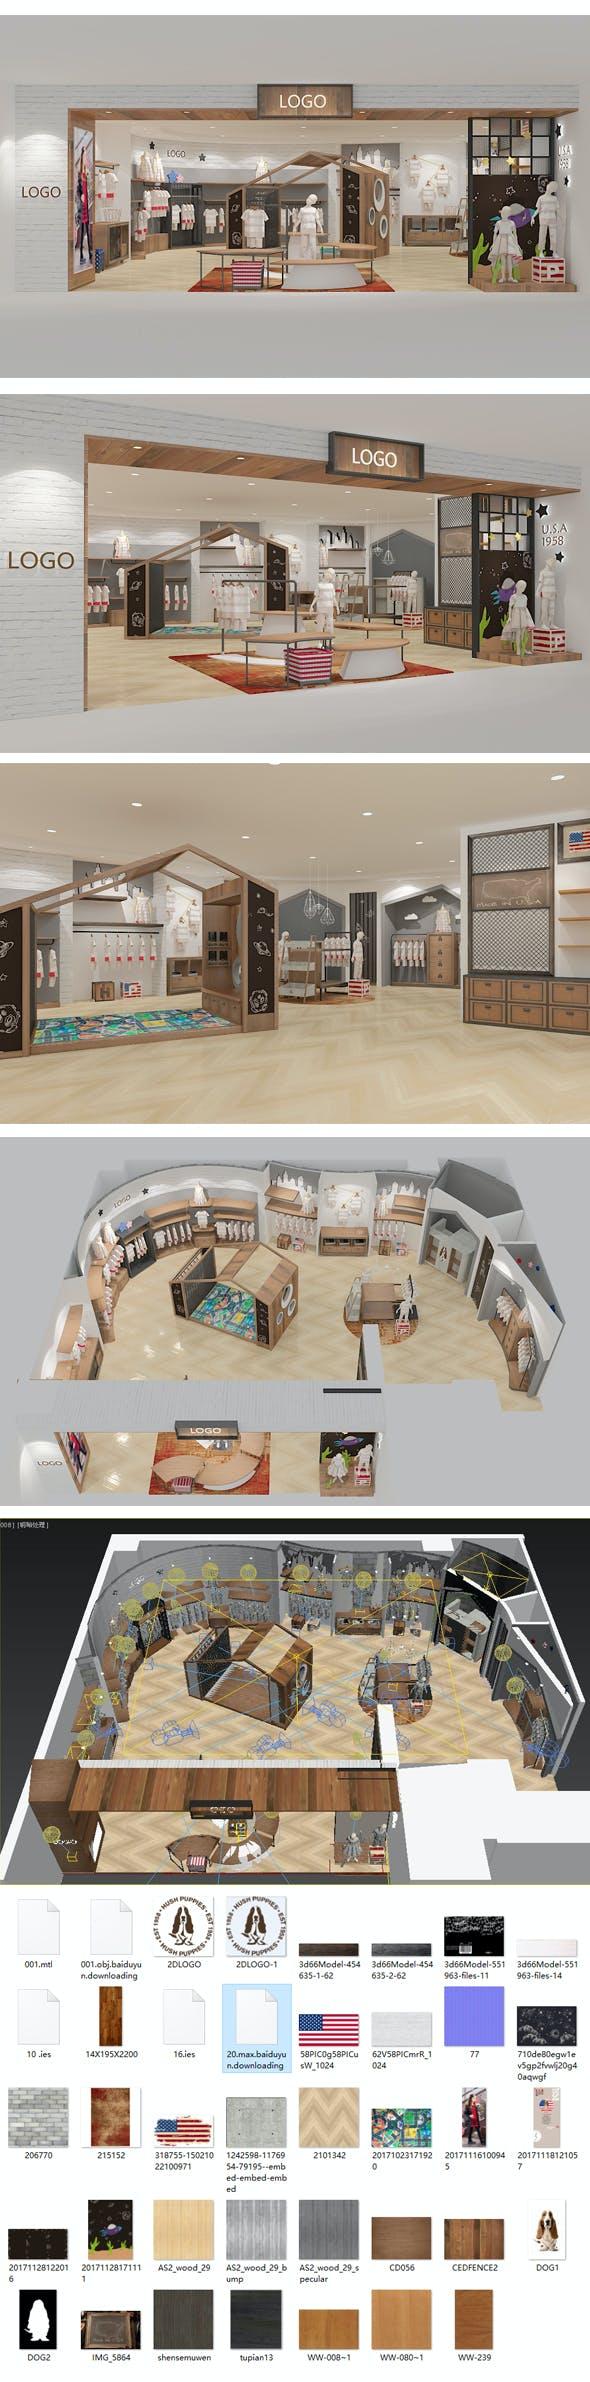 Design of children's clothing store - 3DOcean Item for Sale